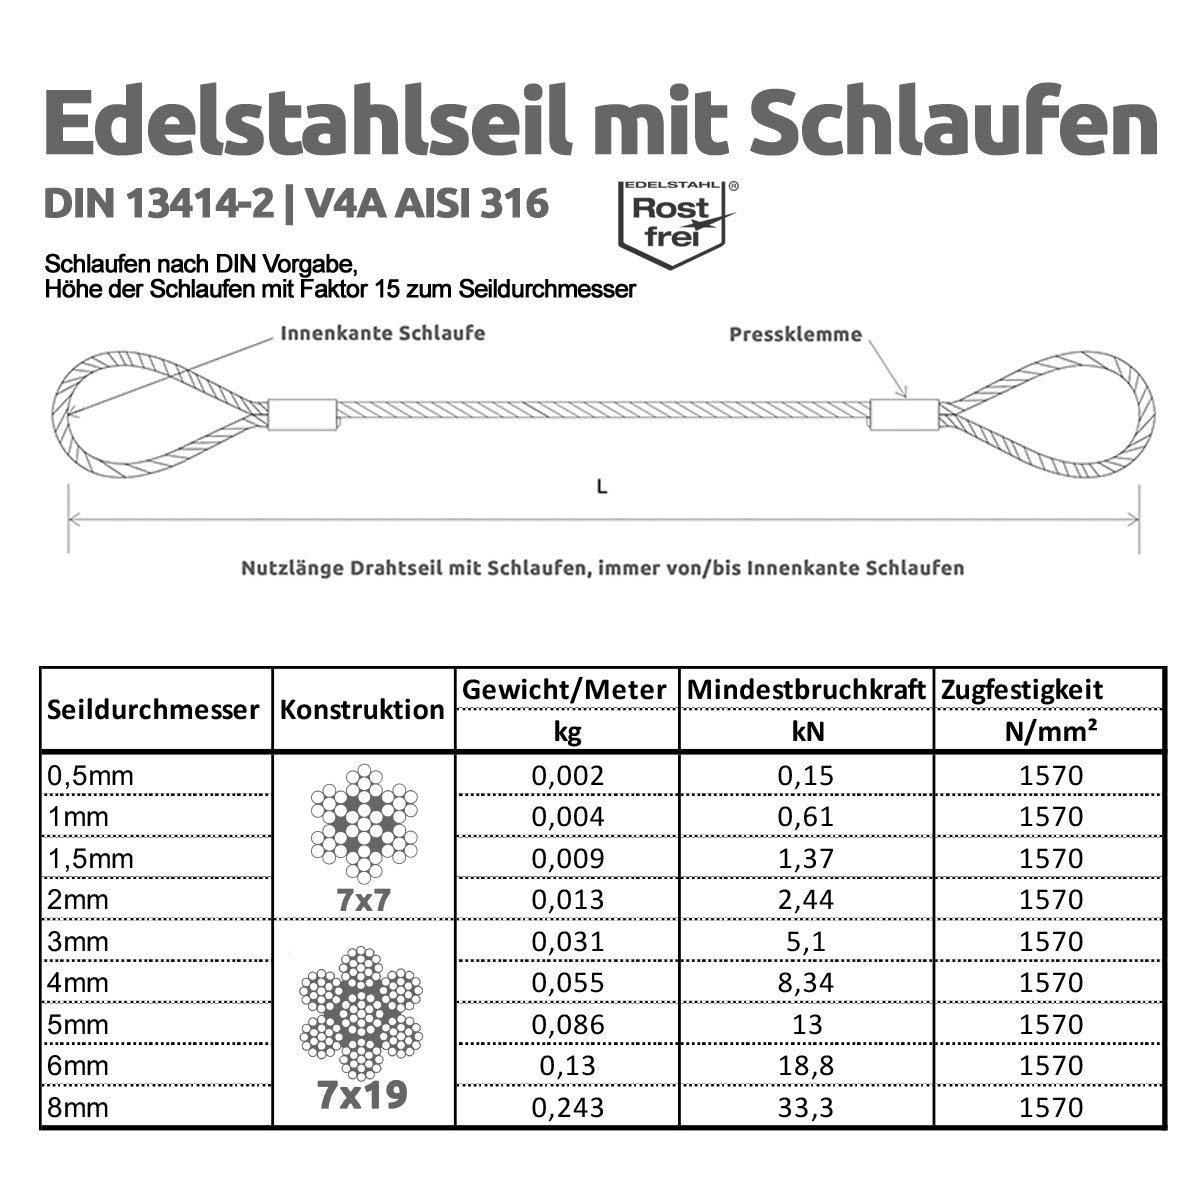 /Ø1mm // 10kg Nutzlast V4A AISI 316 Edelstahl Drahtseil mit Schlaufen Drahtseile24 Edelstahlseil mit /Ösen 0,5m